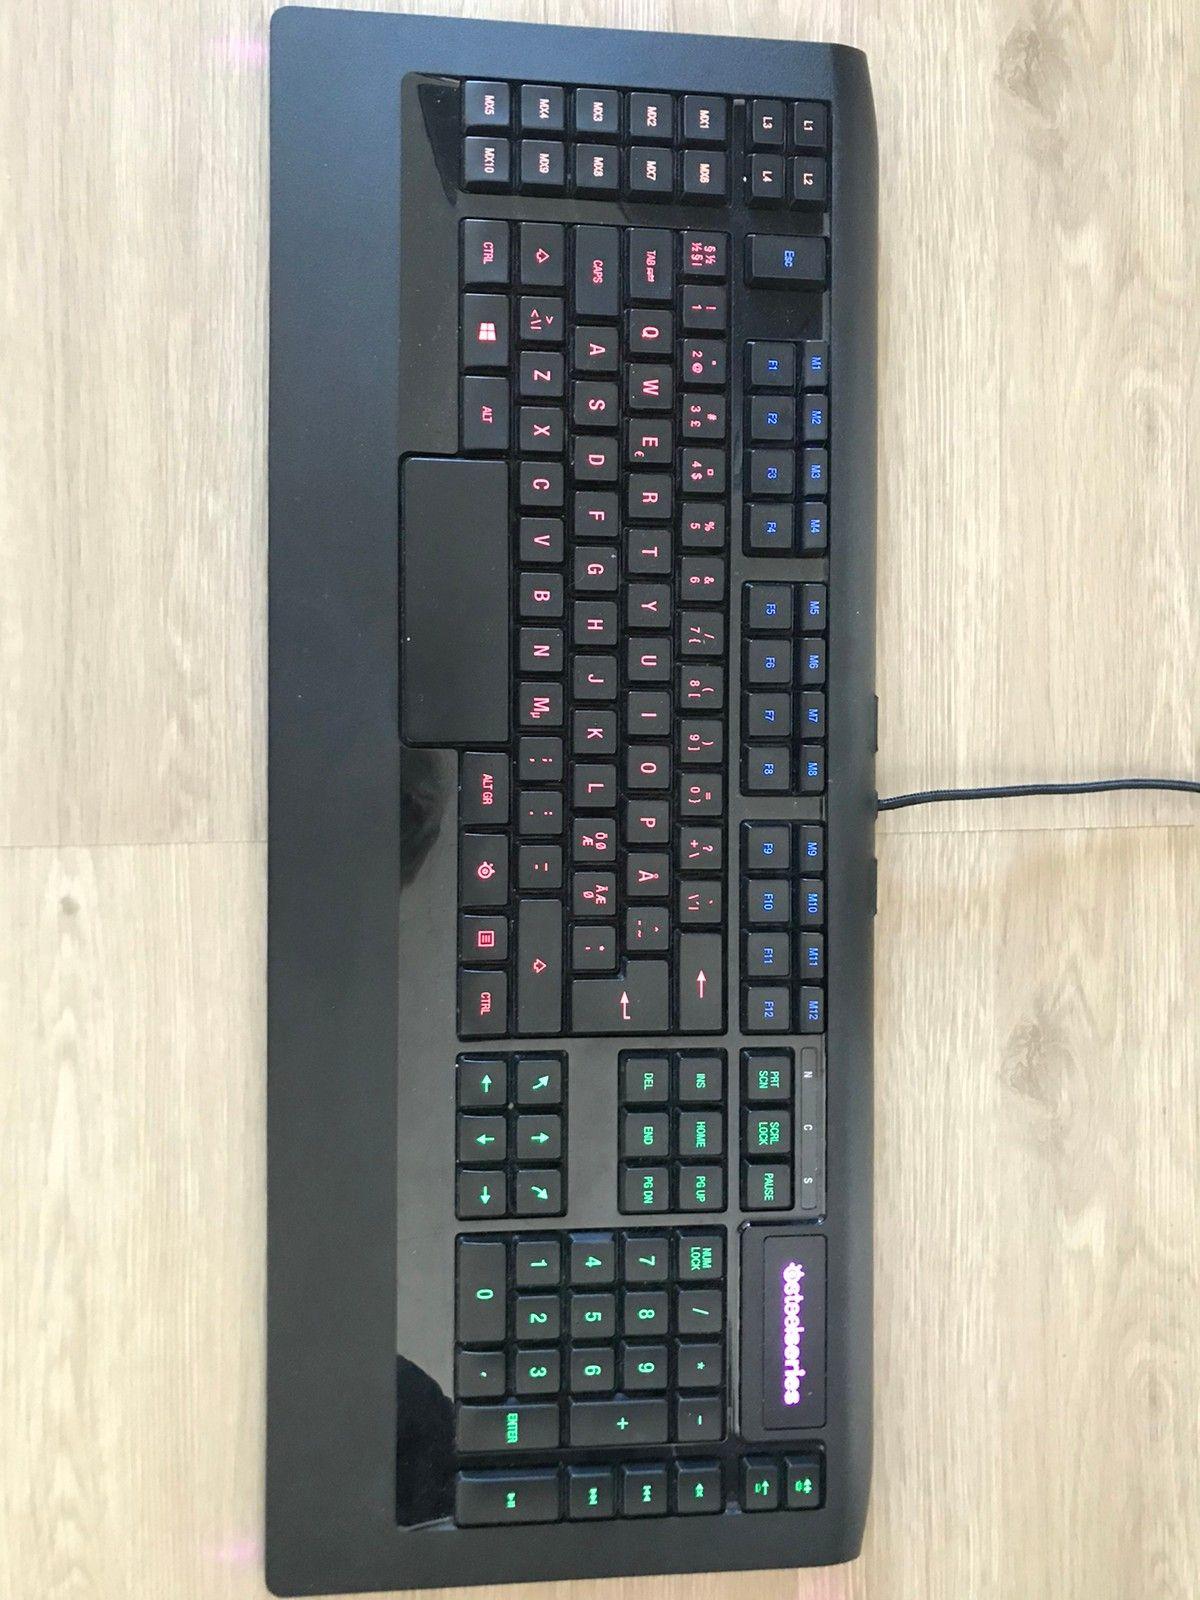 Steelseries apex 350 gaming tastatur | FINN.no